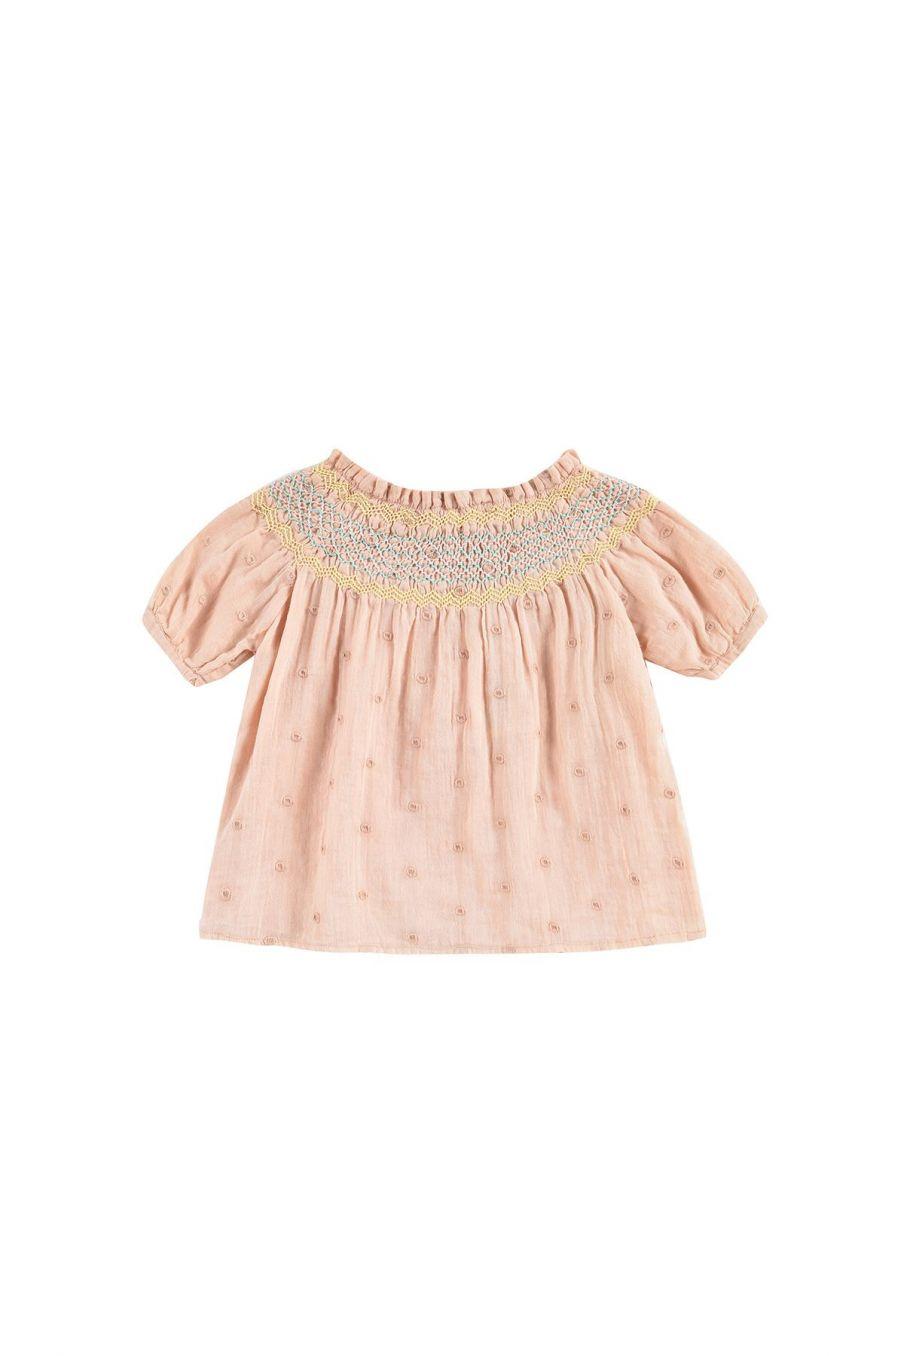 boheme chic vintage blouse fille tyra sienna plumetis